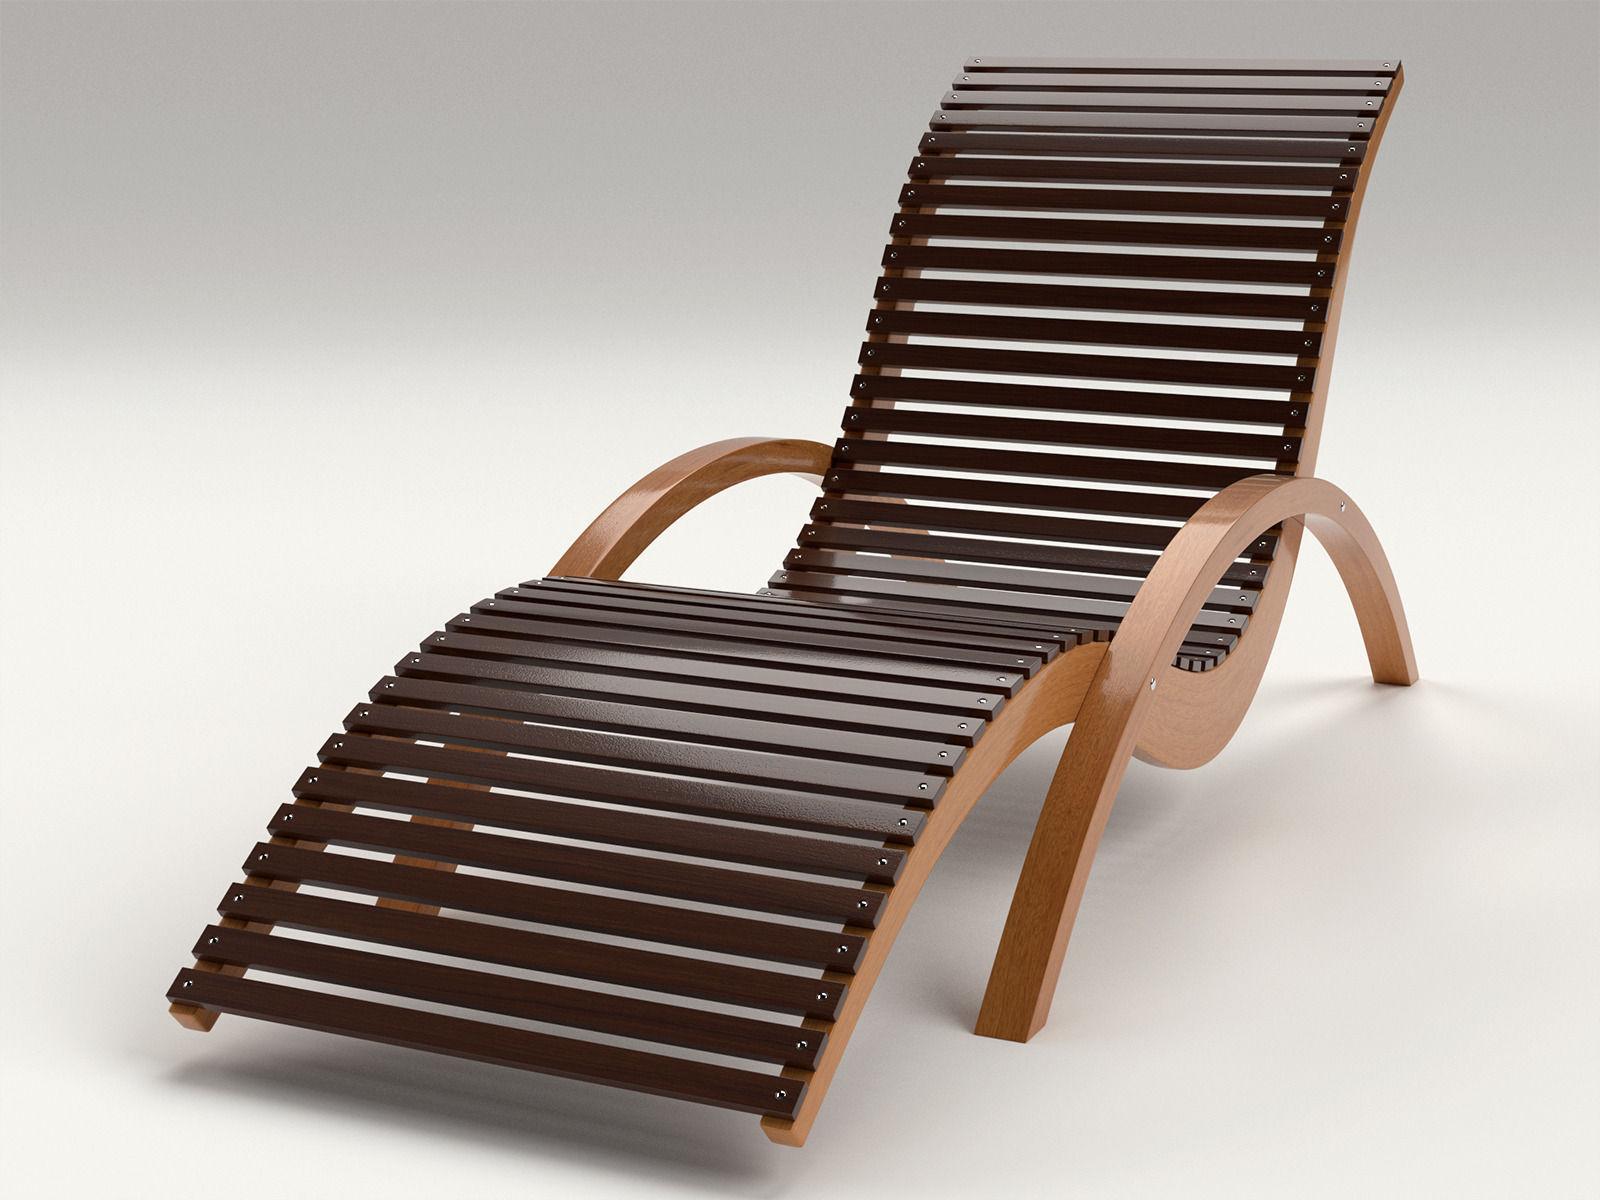 Delightful ... Lounge Chair Outdoor Wood Patio Deck 3d Model Obj Dxf Mtl 2 ...